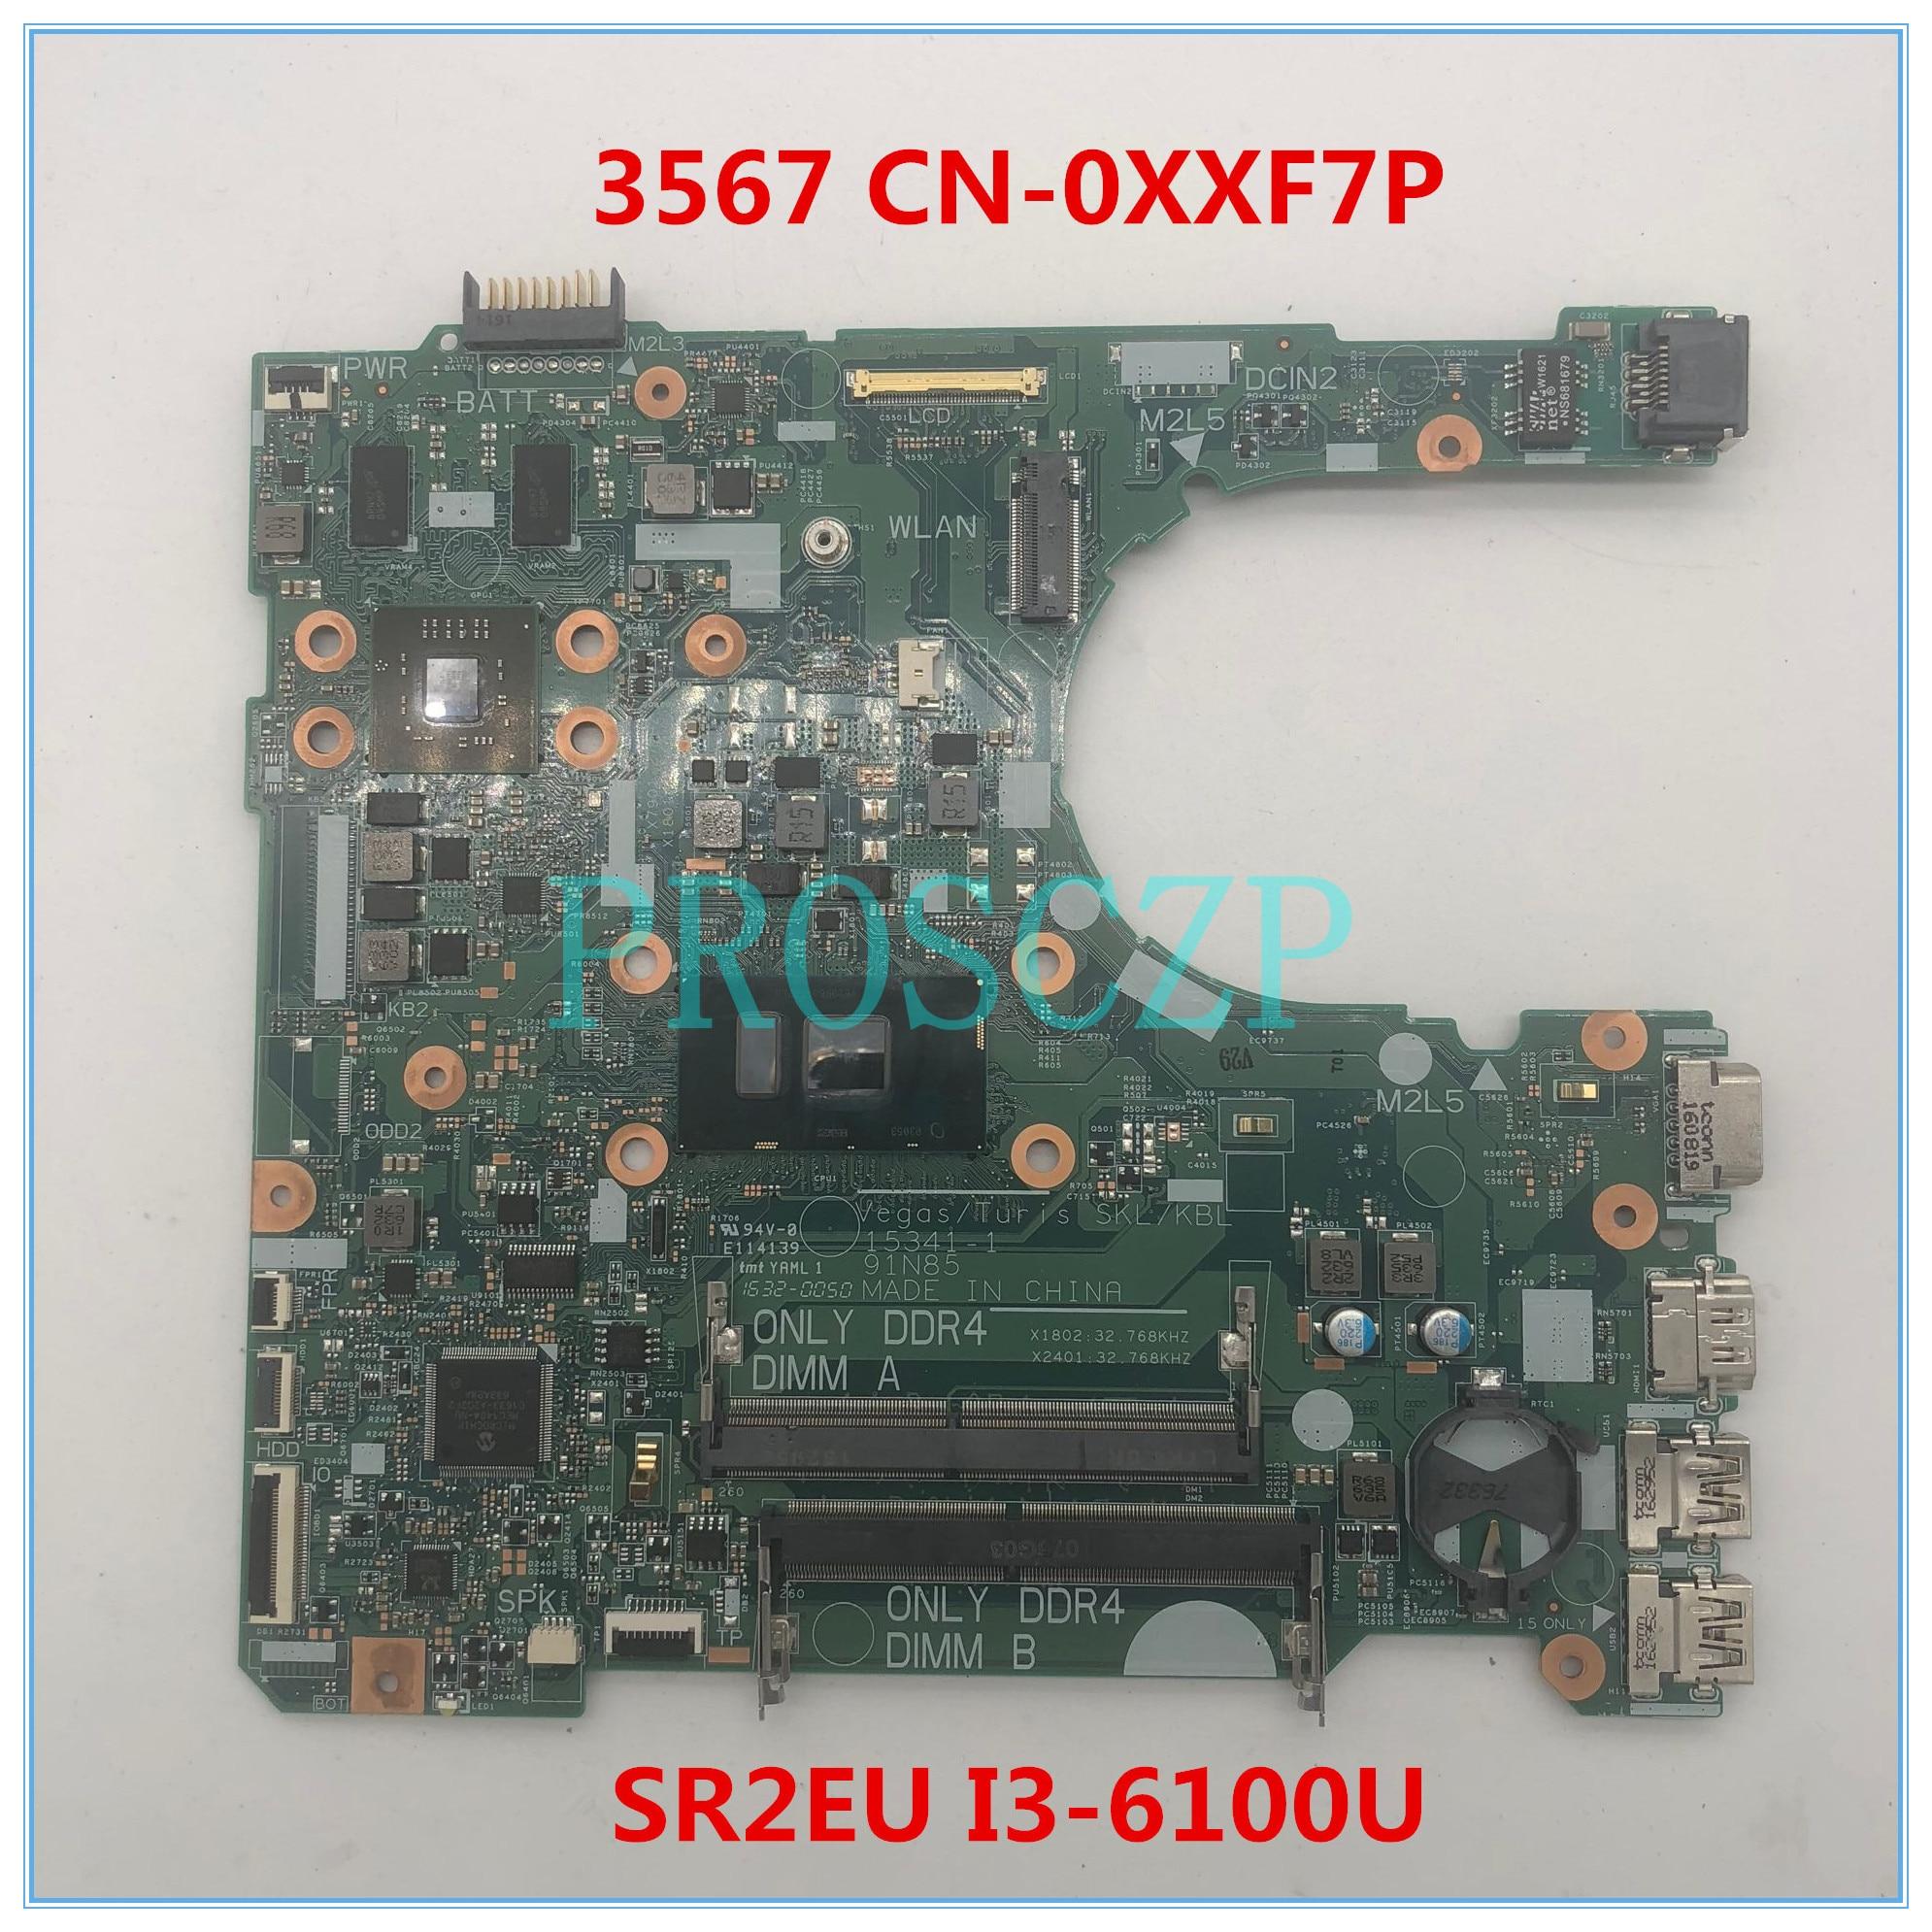 Placa base de ordenador portátil Inspiron 15 3567 de alta calidad CN-0XXF7P 0XXF7P XXF7P 15341-1 con CPU SR2EU I3-6100U 100% funciona bien